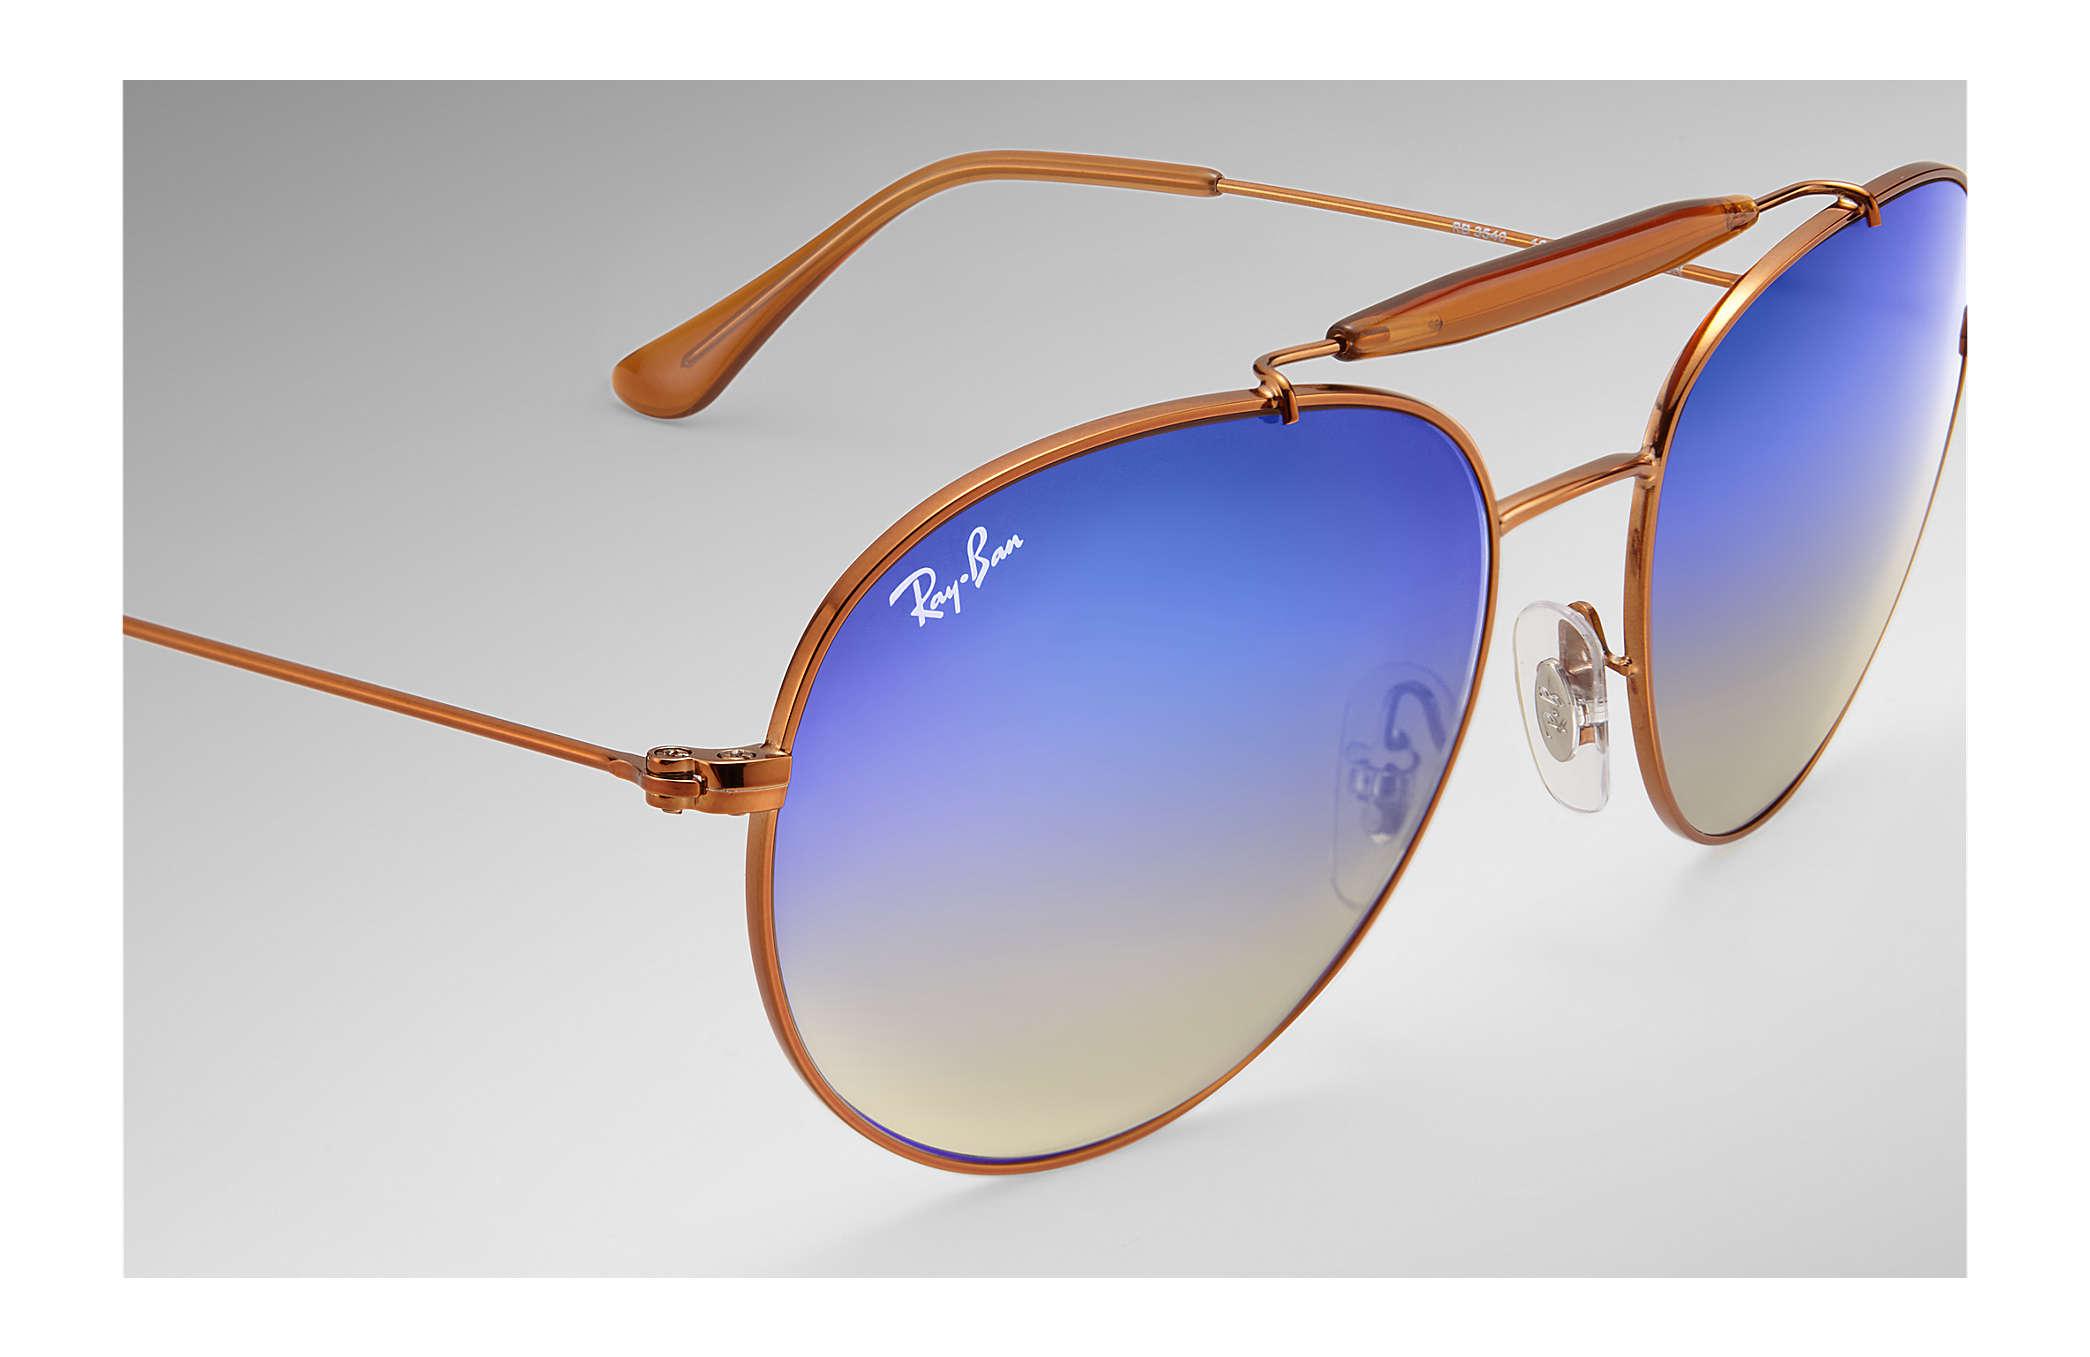 b4630f4f61 Ray-Ban RB3540 Bronze-Copper - Metal - Blue Lenses - 0RB3540198 8B53 ...